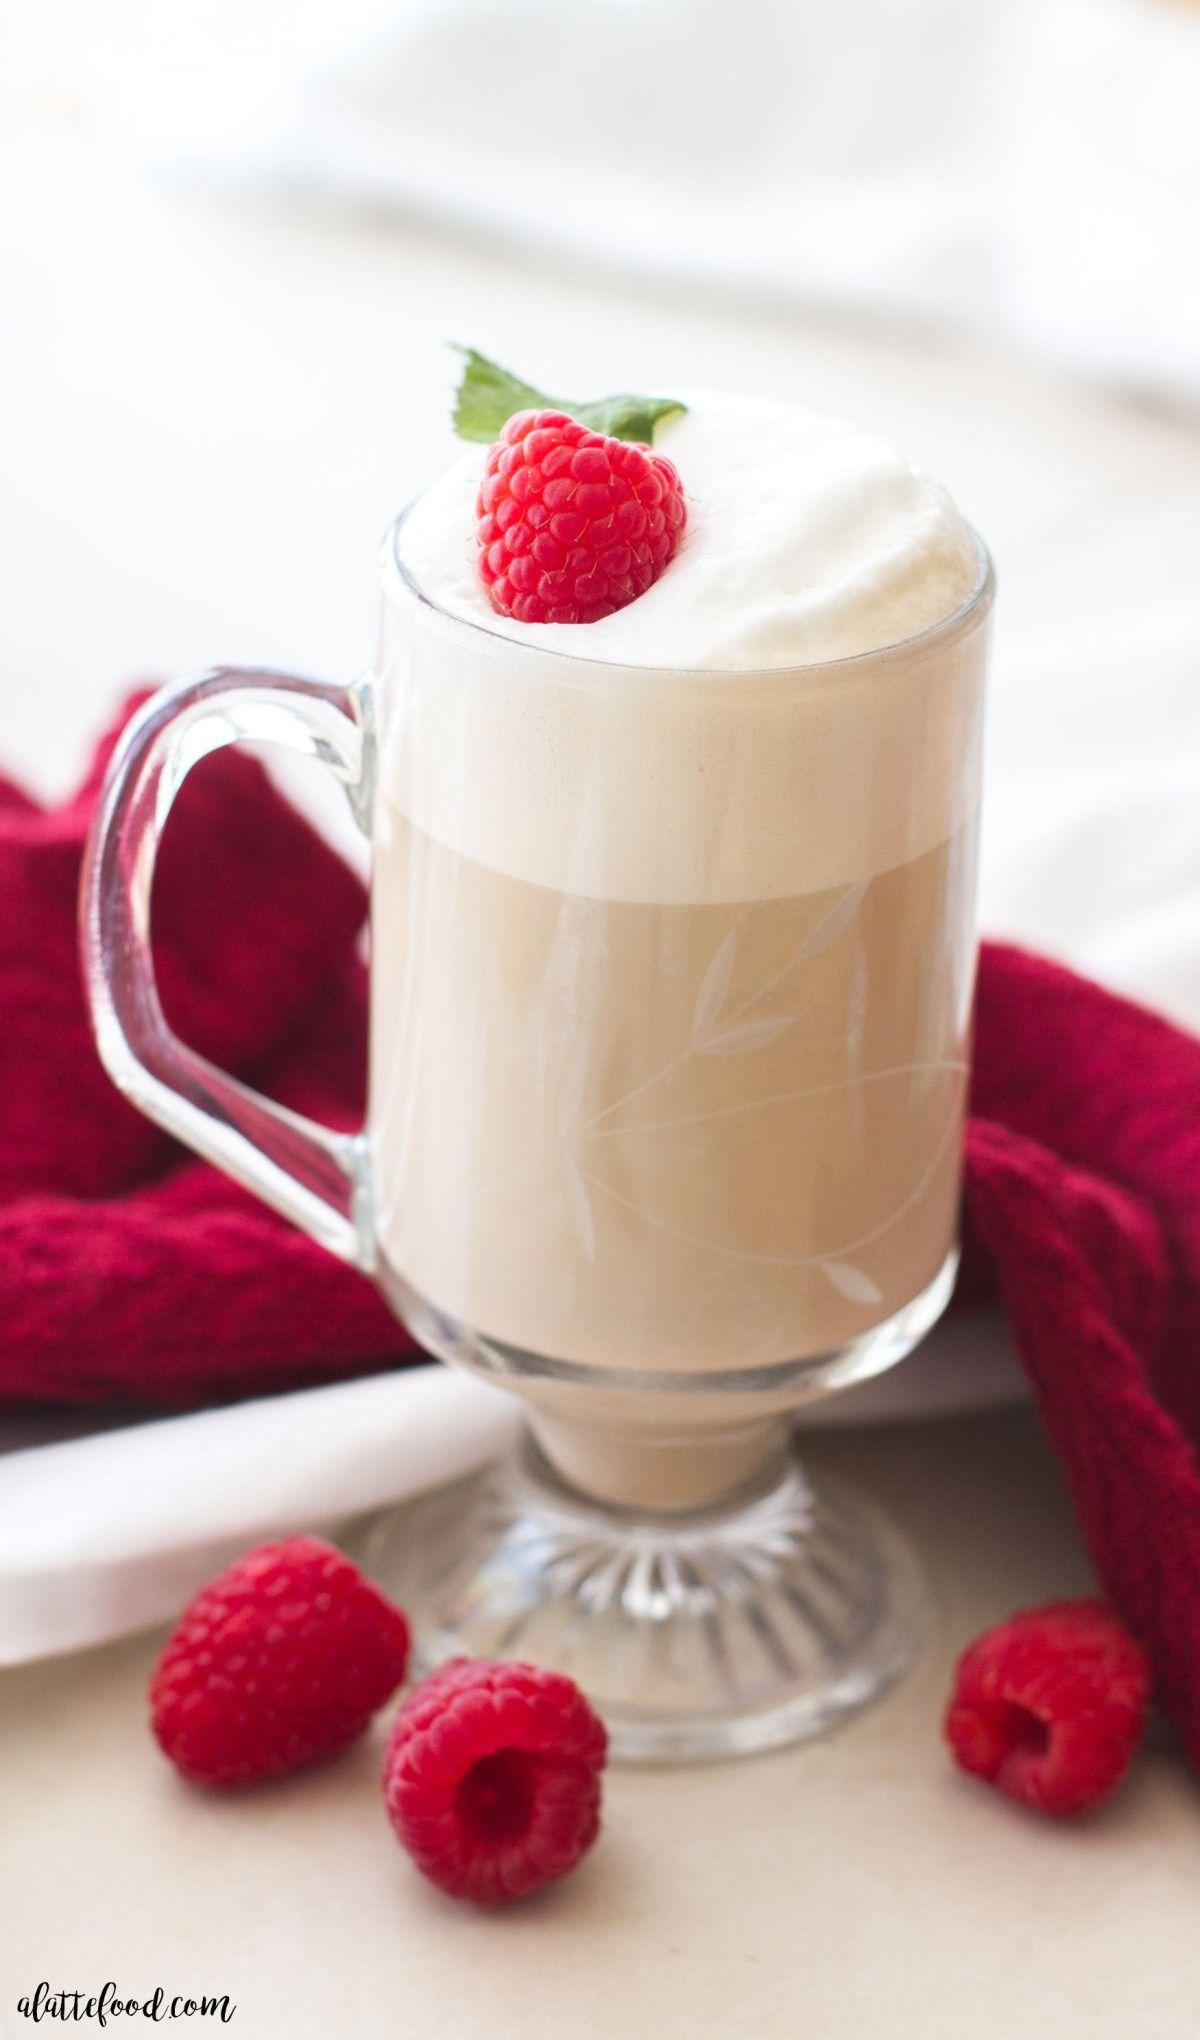 50+ White chocolate coffee creamer inspirations